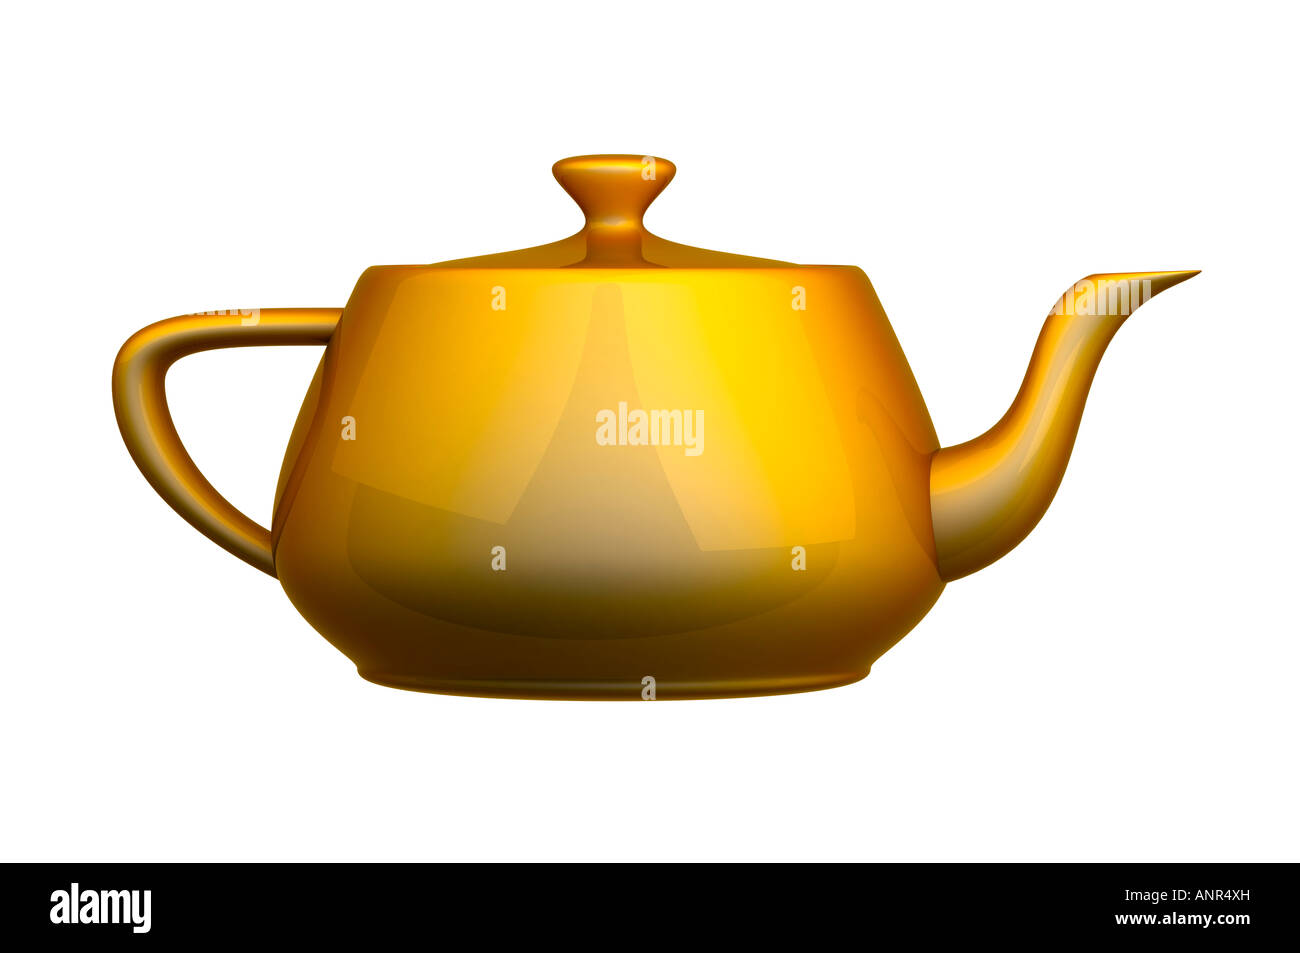 Golden Tea pot kettle - Stock Image